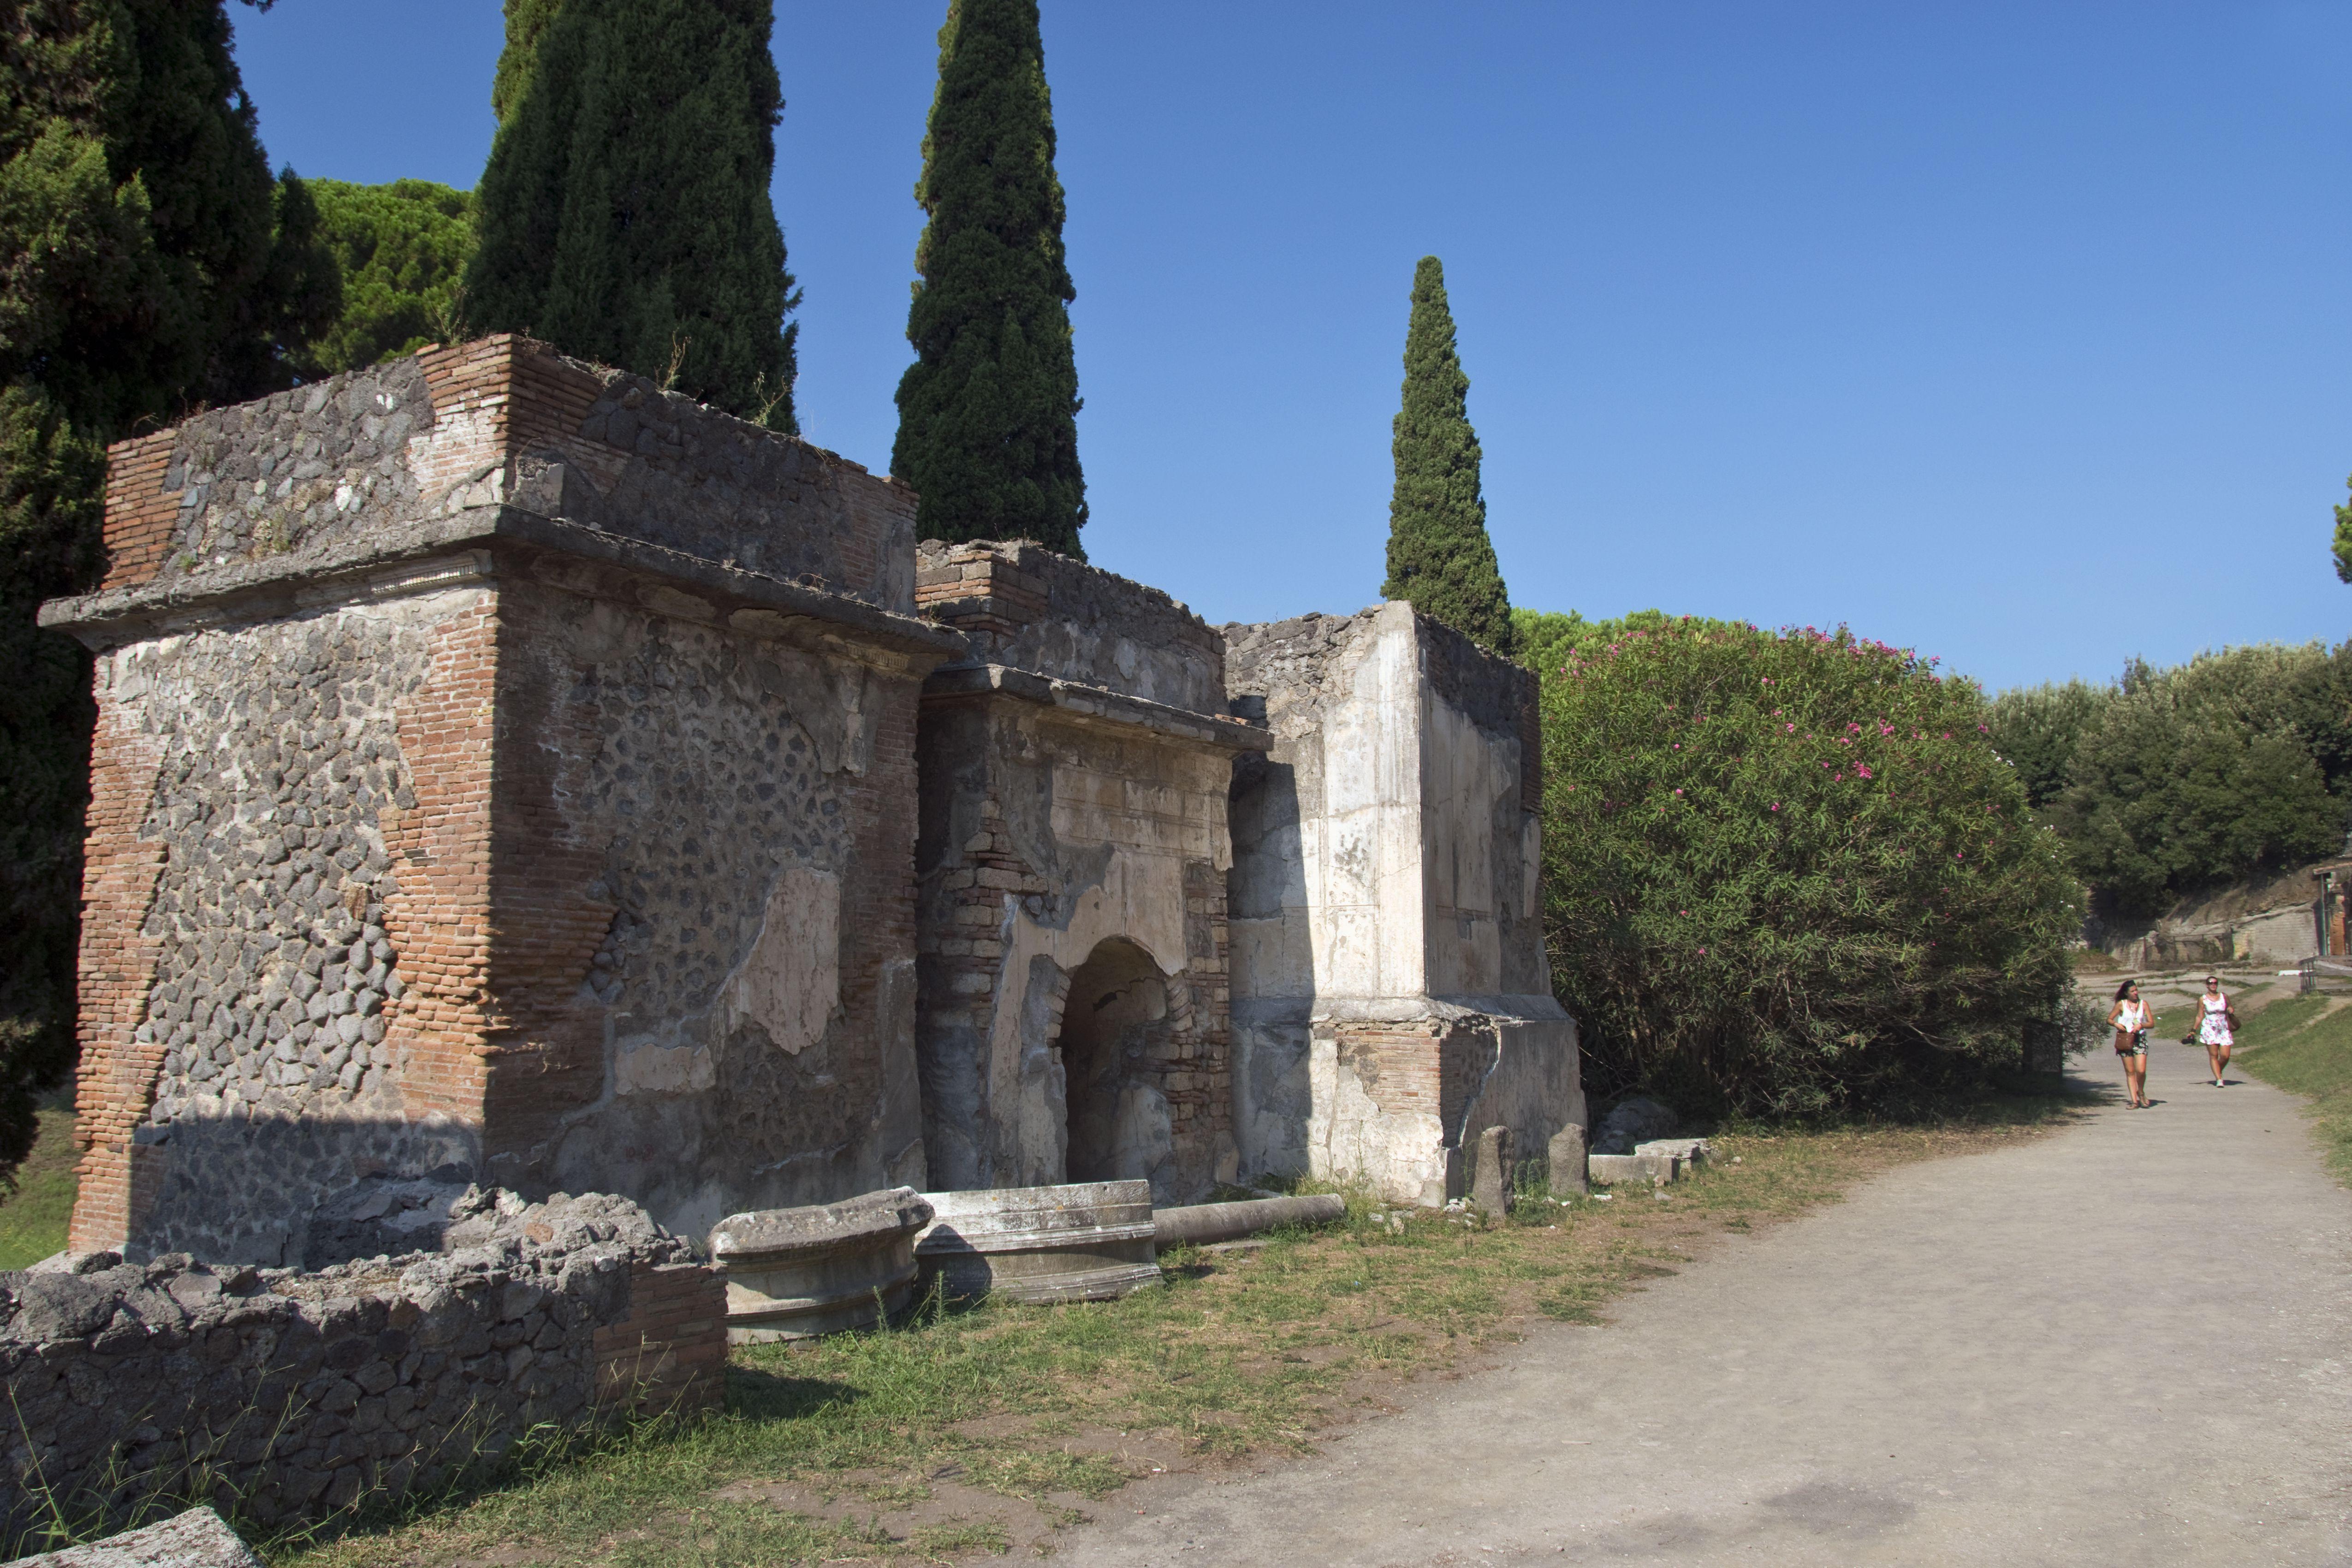 The Street of Tombs, Pompeii, Italy